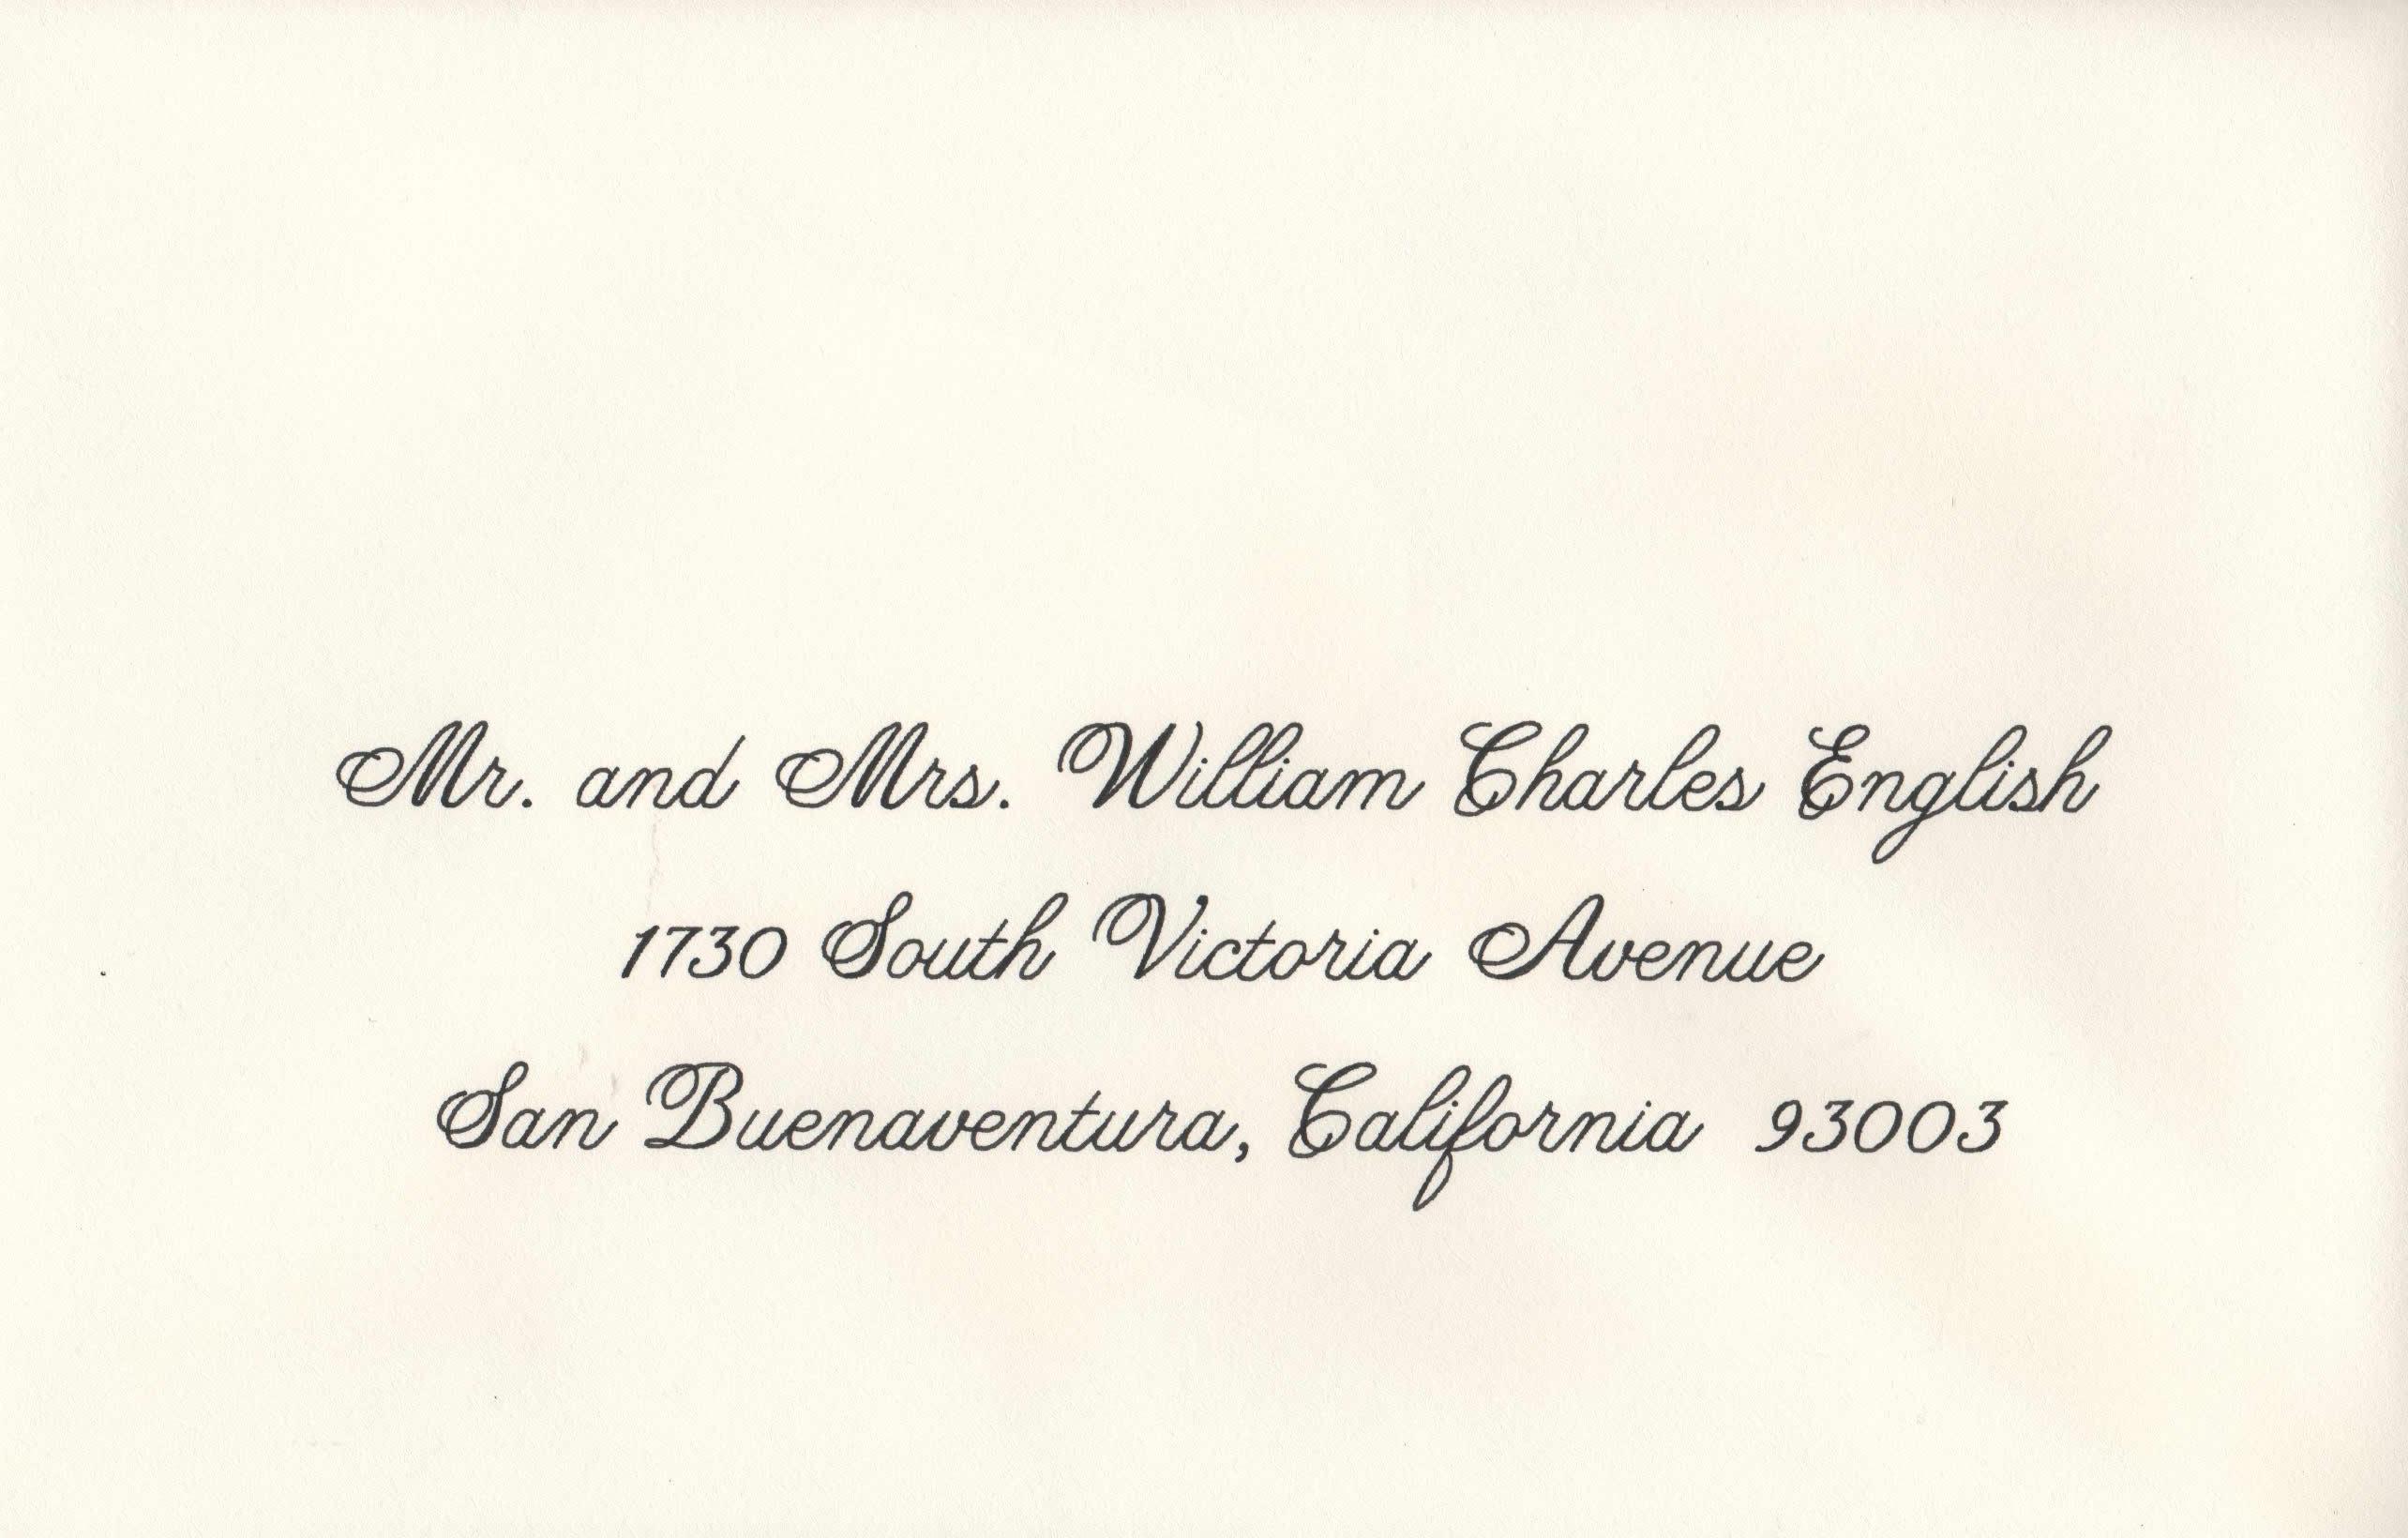 Premium calligraphy fonts lautzenhiser s stationery